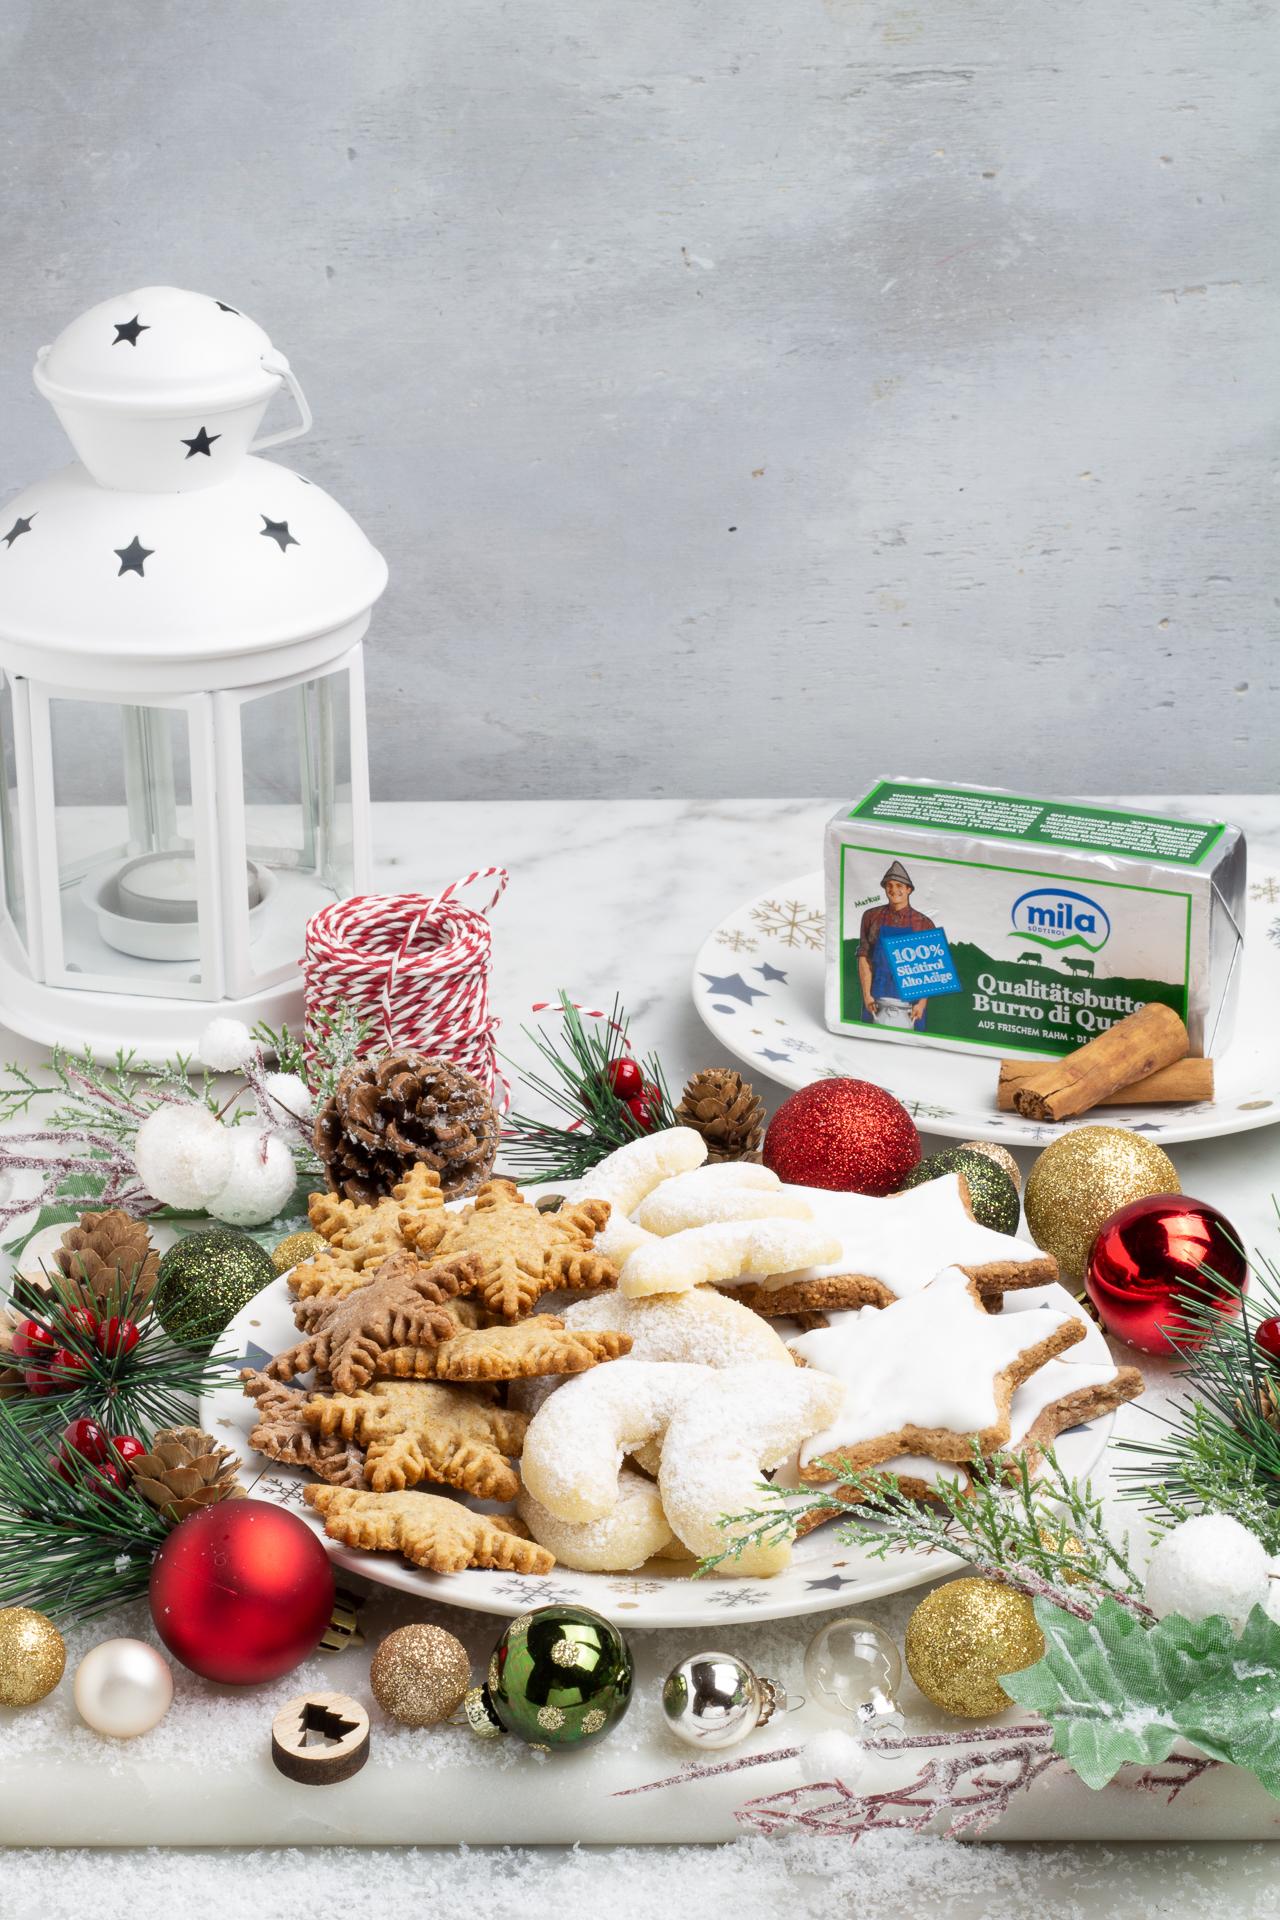 biscotti natalizi altoatesini